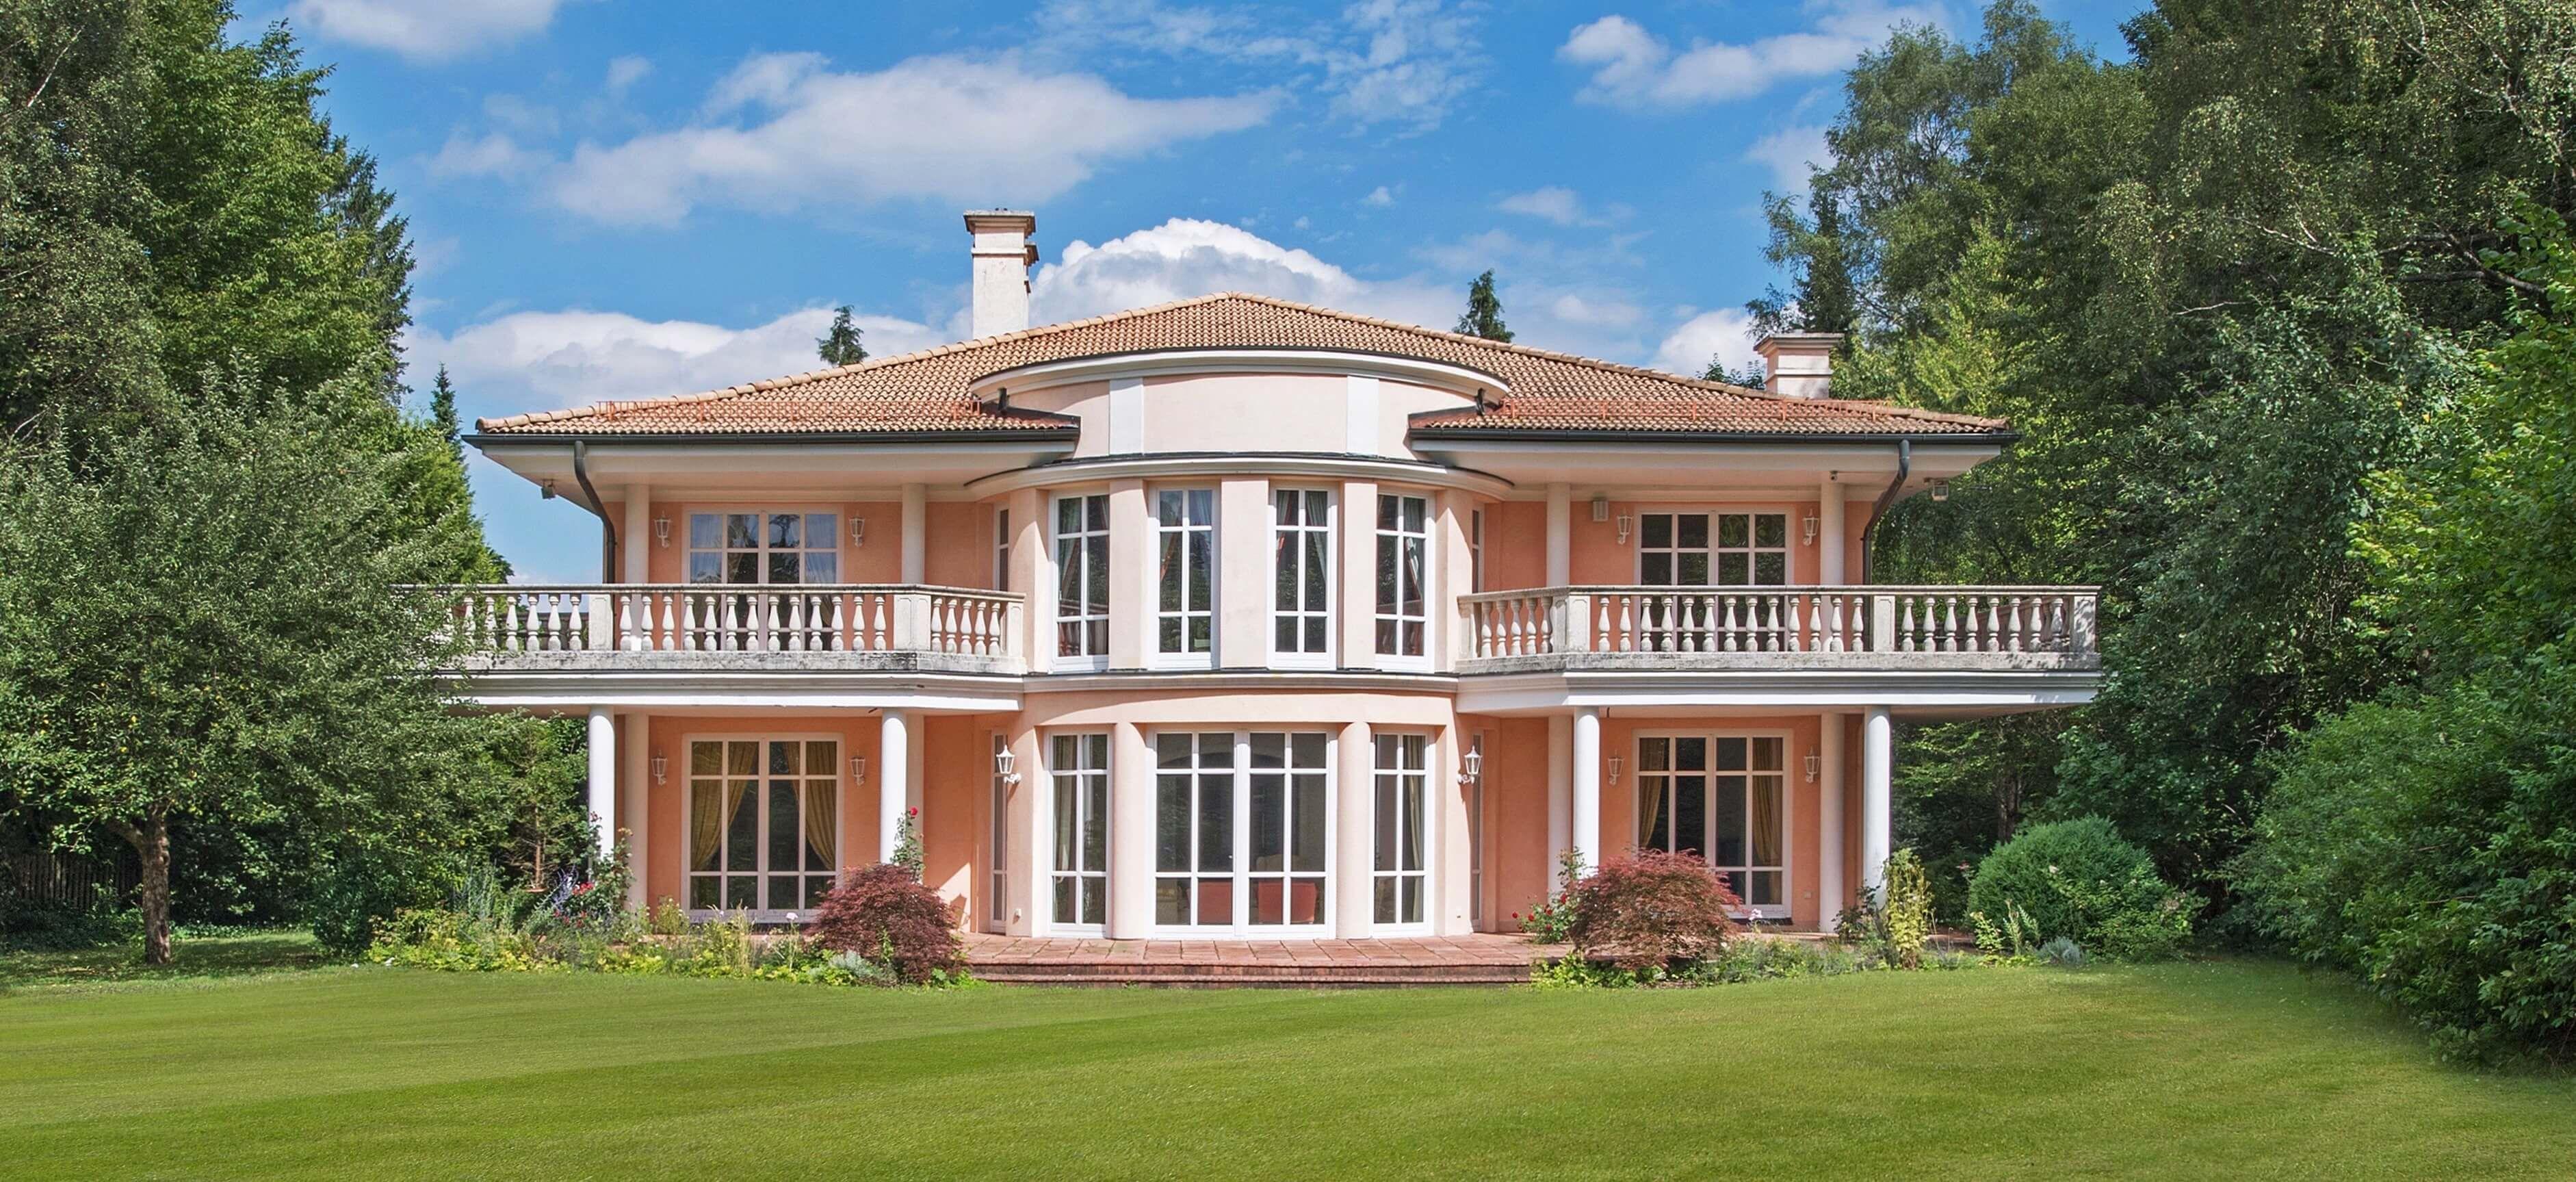 Get details of Classic Elegance in Grünwald, Germany